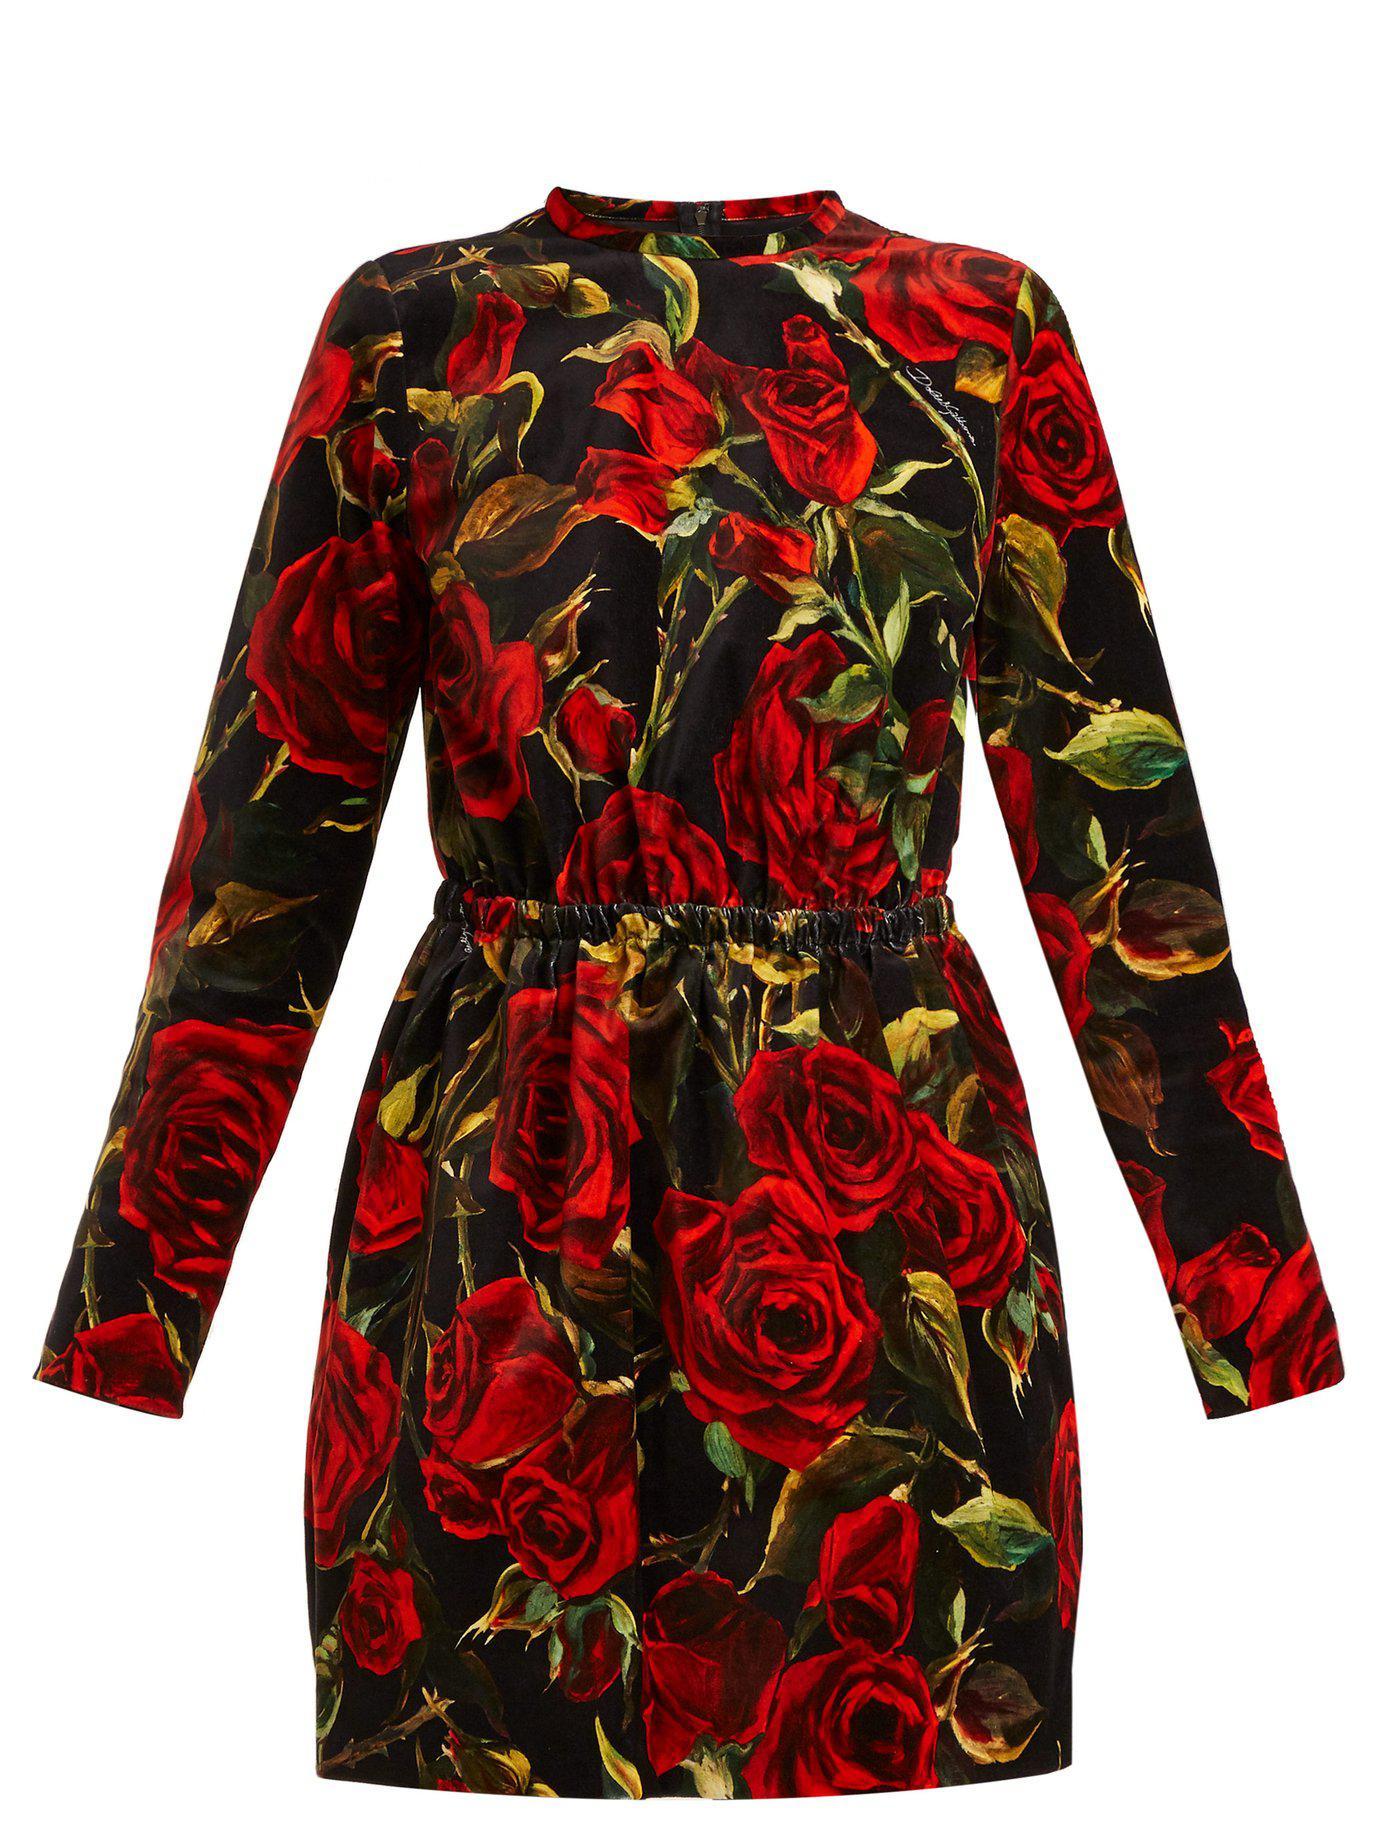 Lyst - Dolce   Gabbana Floral-printed Velvet Minidress in Red - Save 14% 3cc649bba